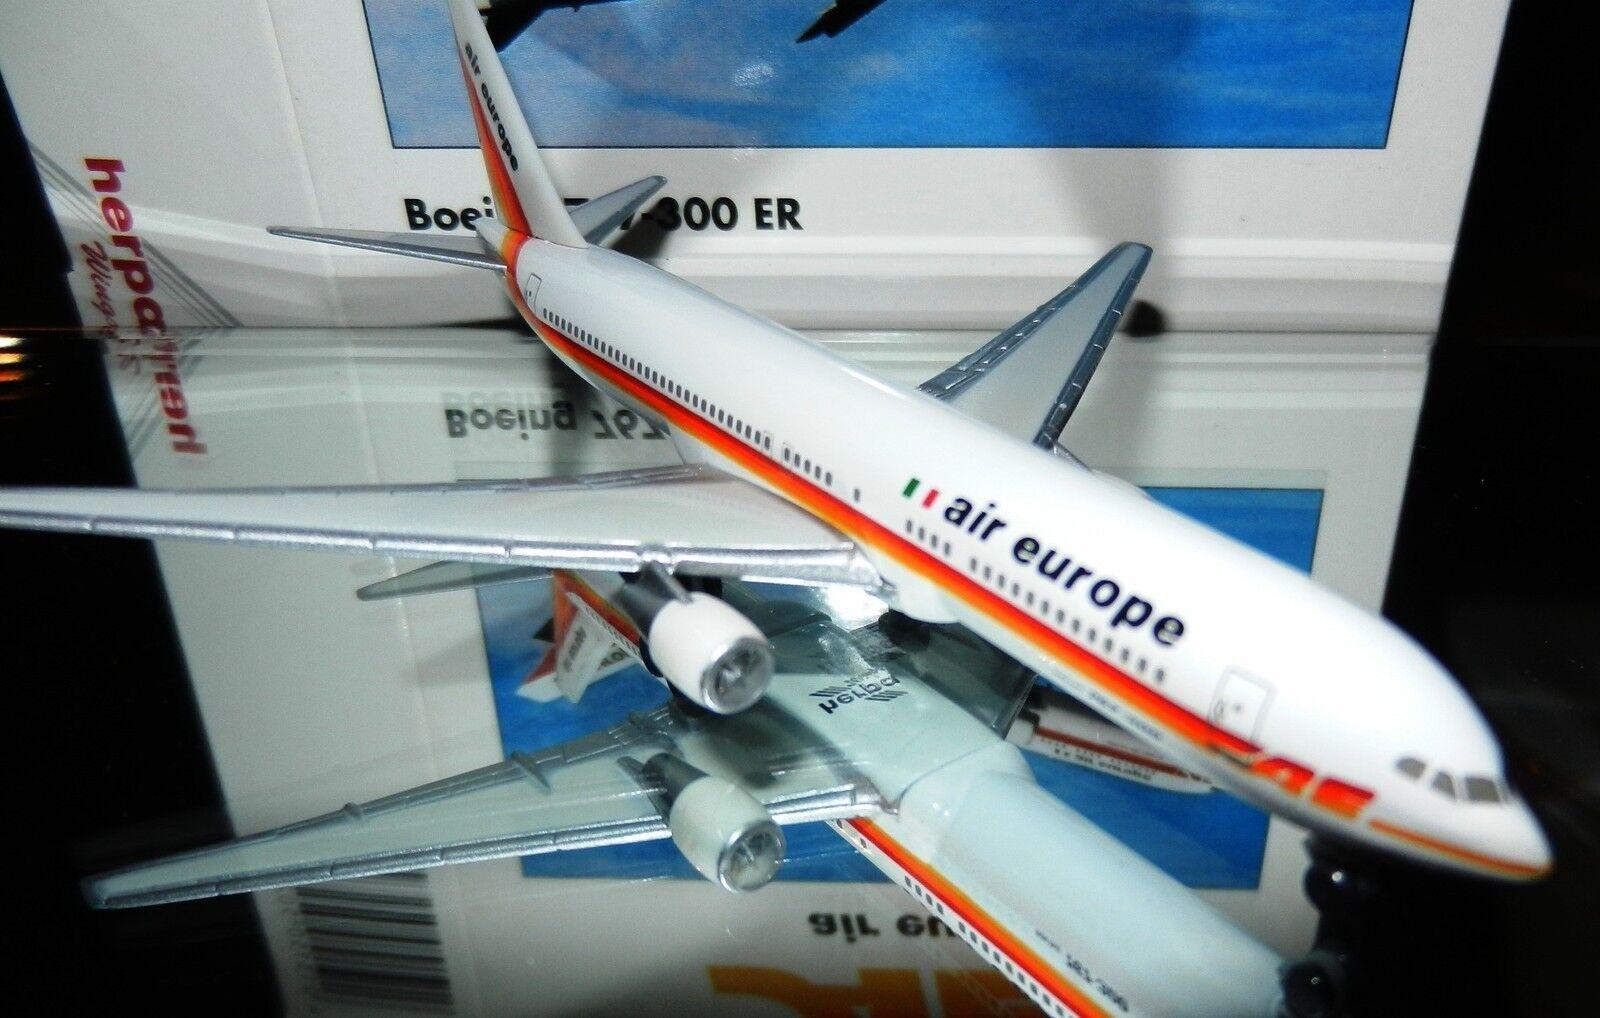 Herpa 502740 air europe AE Boeing 767-300 ER 1 500 Scale Mint in Box RETIRED